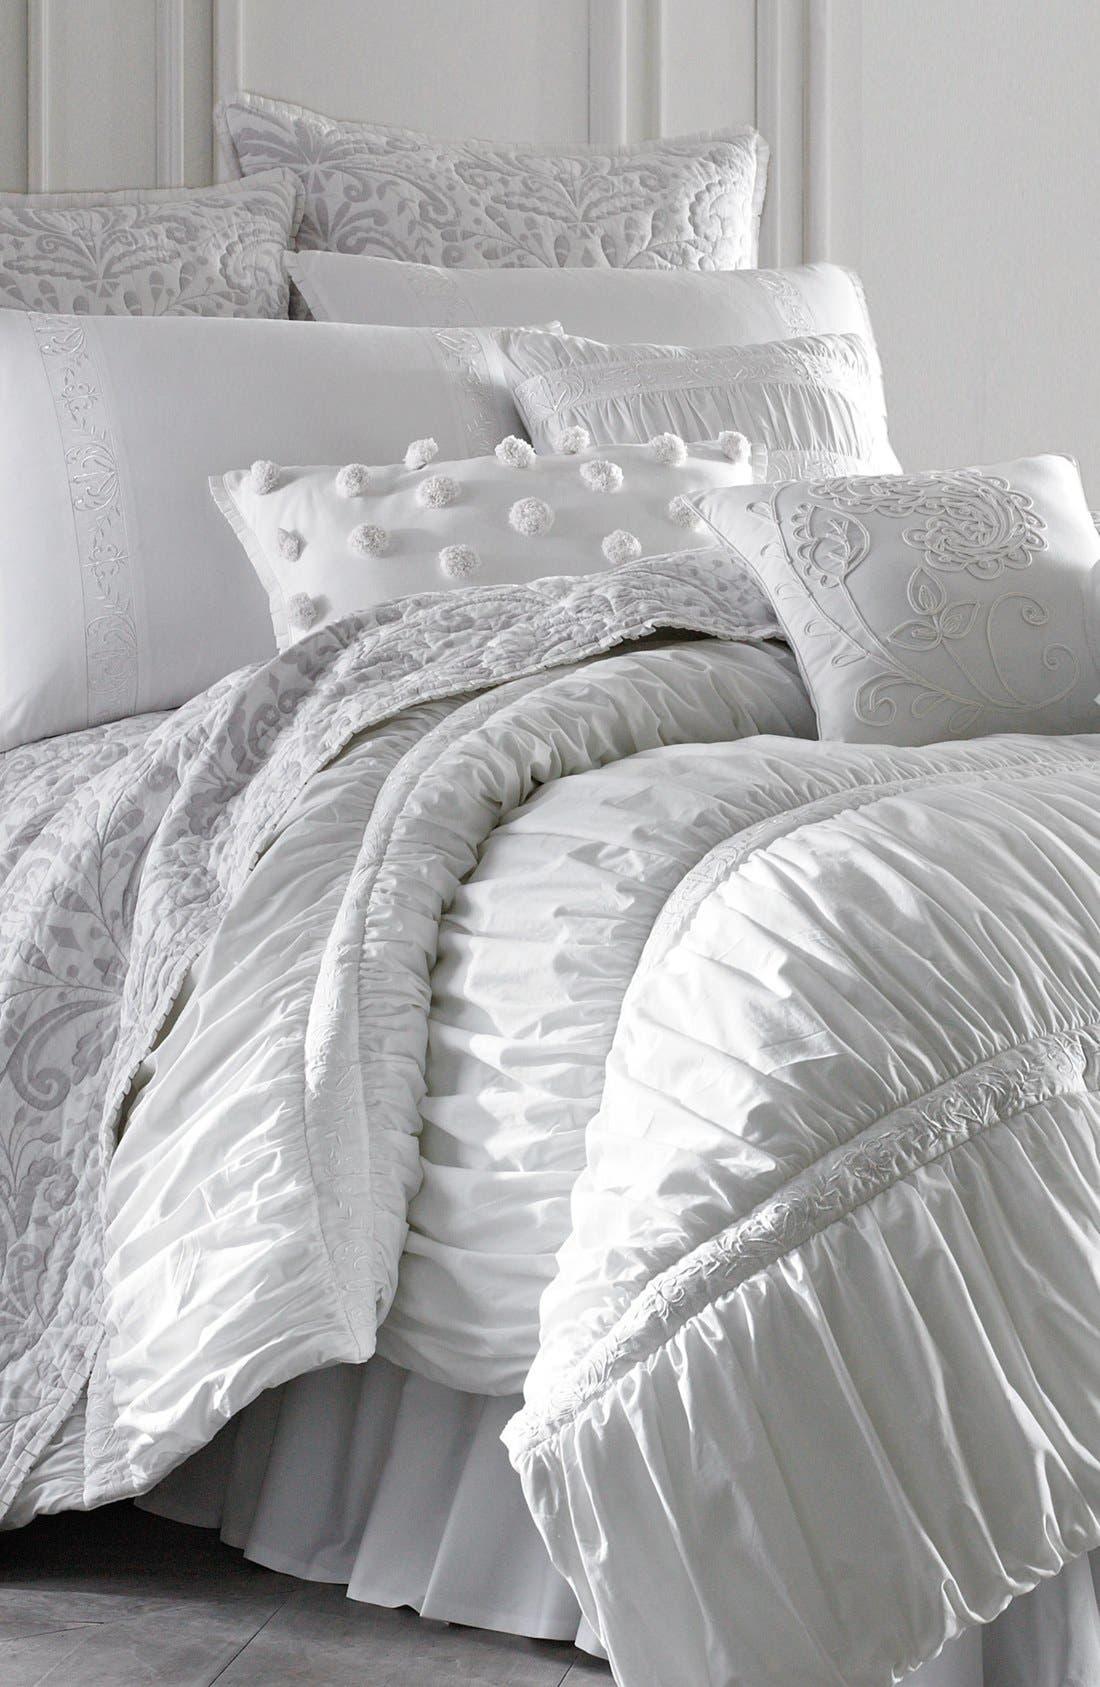 Main Image - Dena Home 'Morning Dove' Comforter